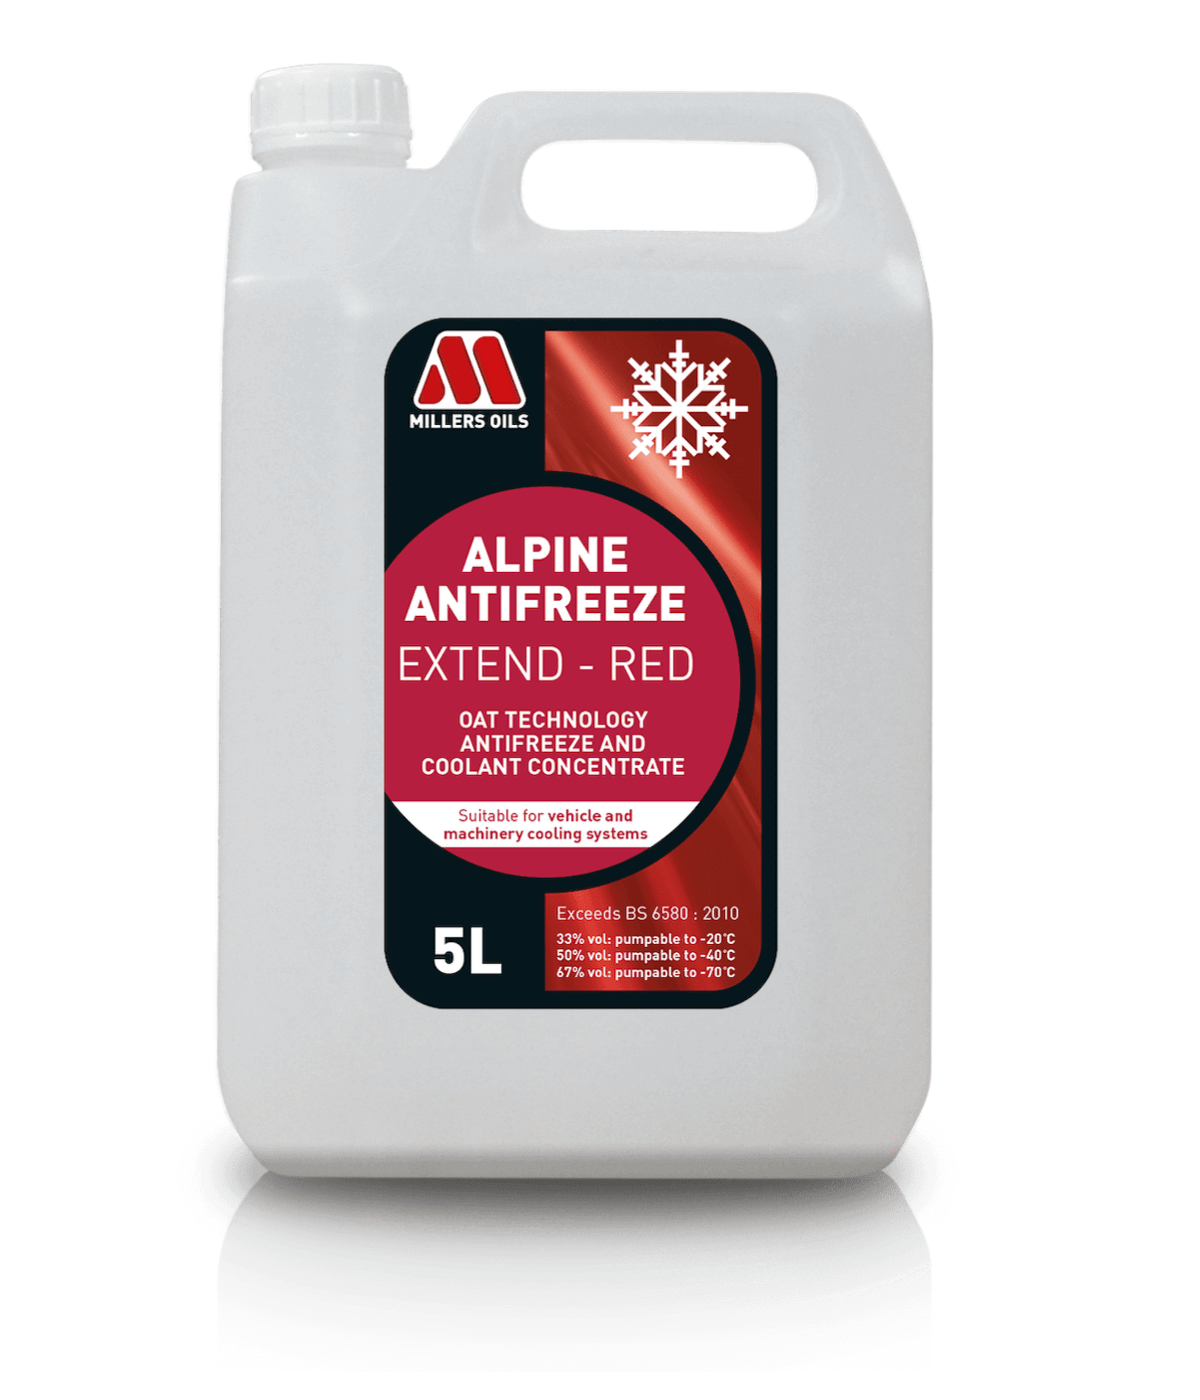 5L Antifreeze EXTEND RED